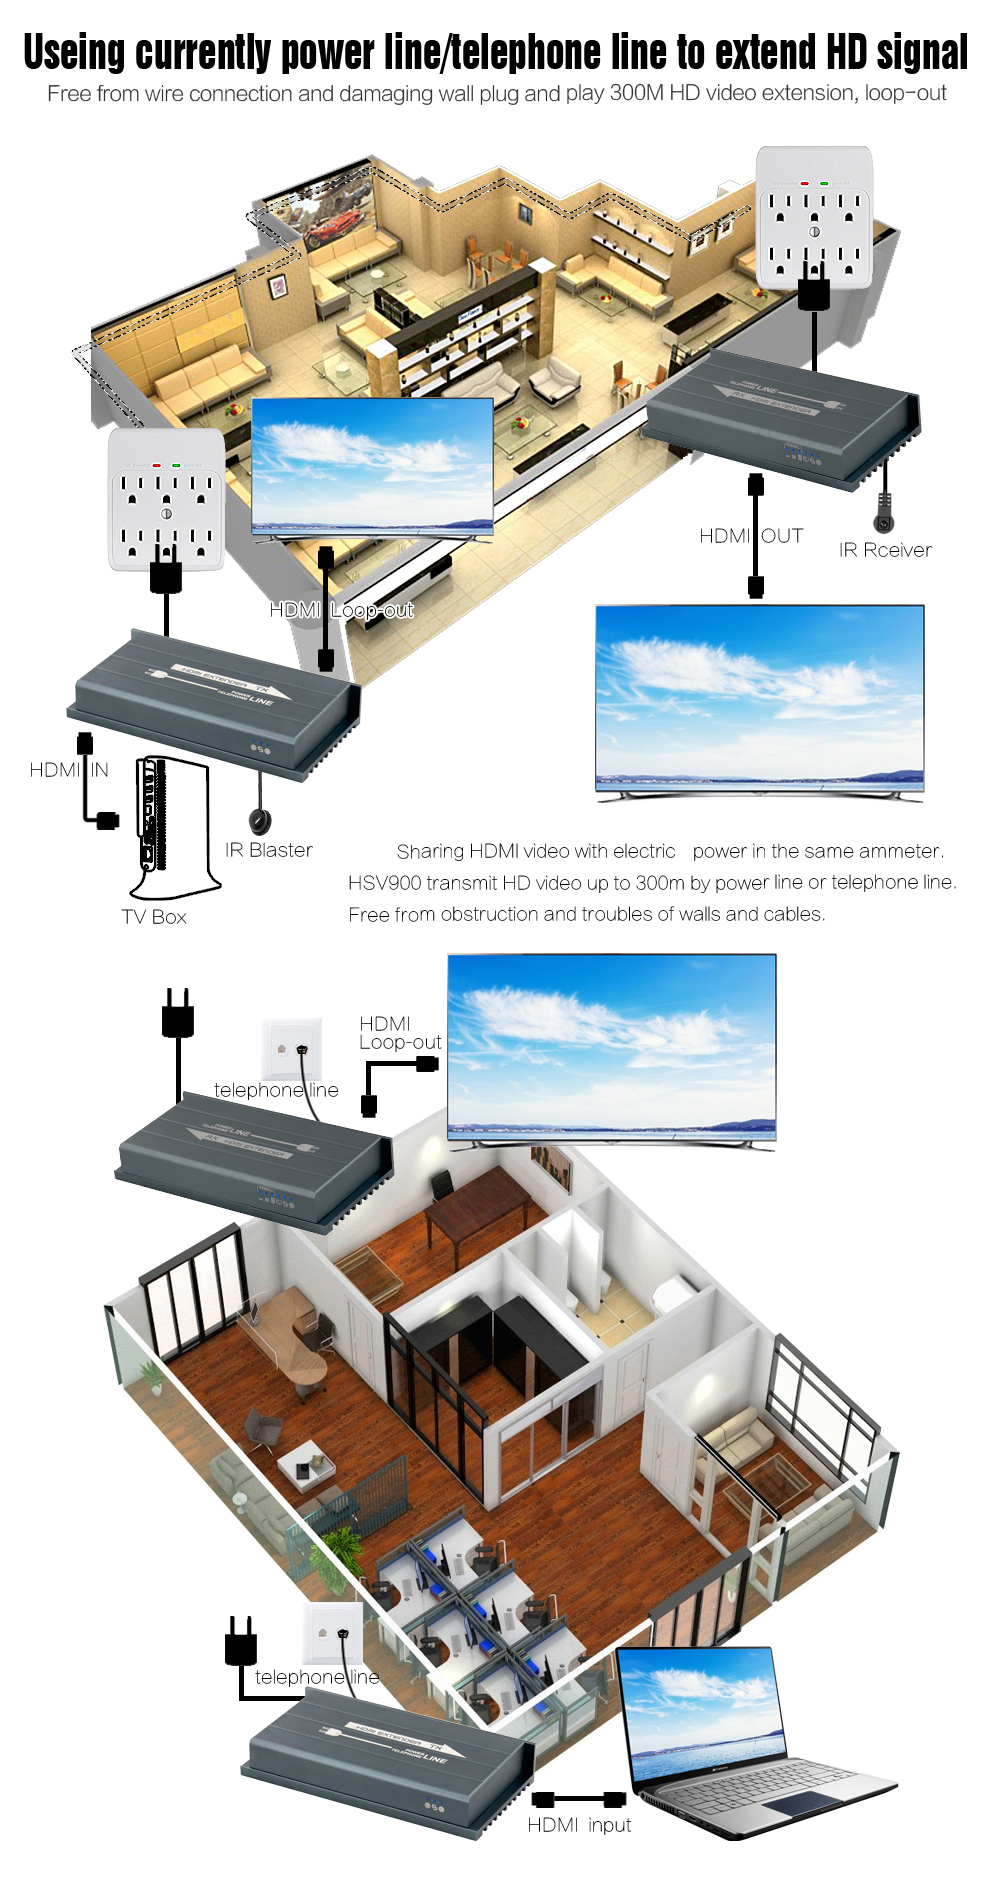 medium resolution of mirabox 300m hdmi extender ir over powerline or telephone line 1080p plc hdmi over powerline extender